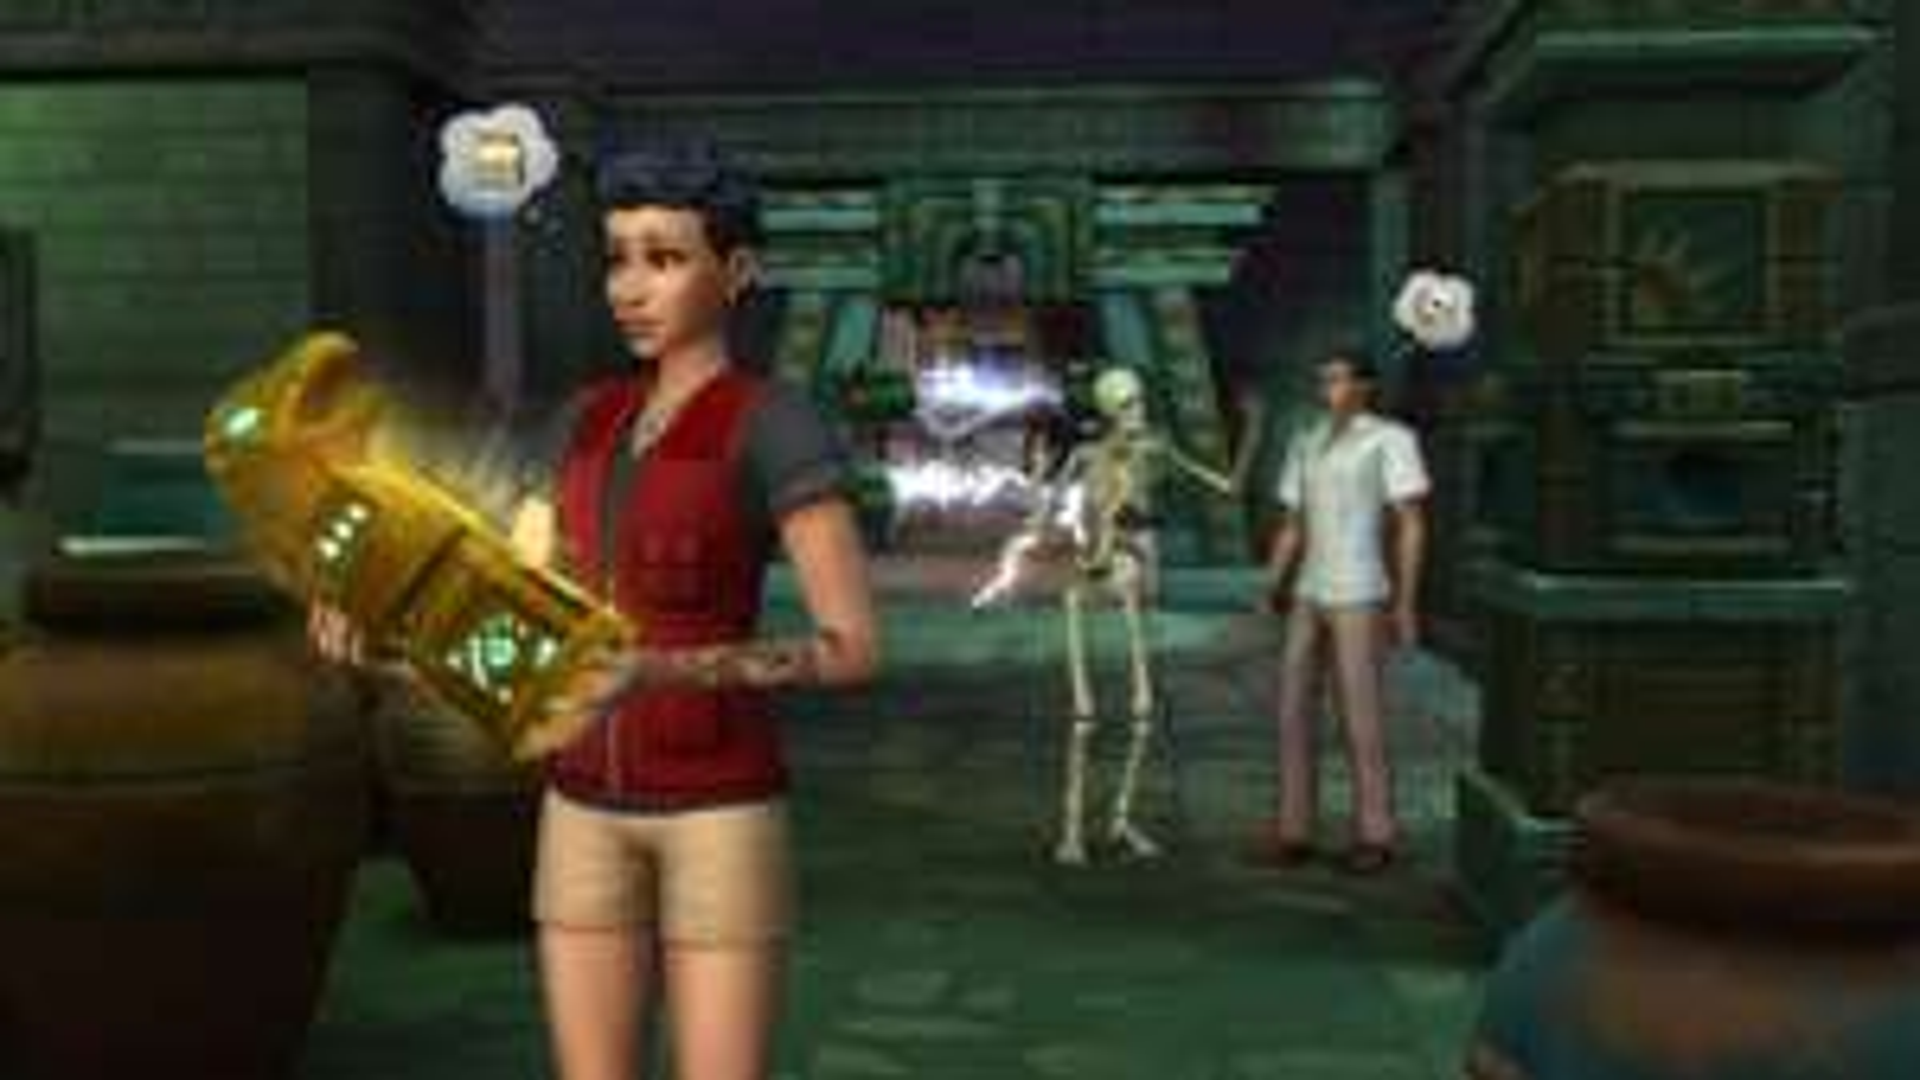 Die Sims 4 - Dschungel-Abenteuer & Outdoor-Leben DLCs - PC/Mac [Origin Access]